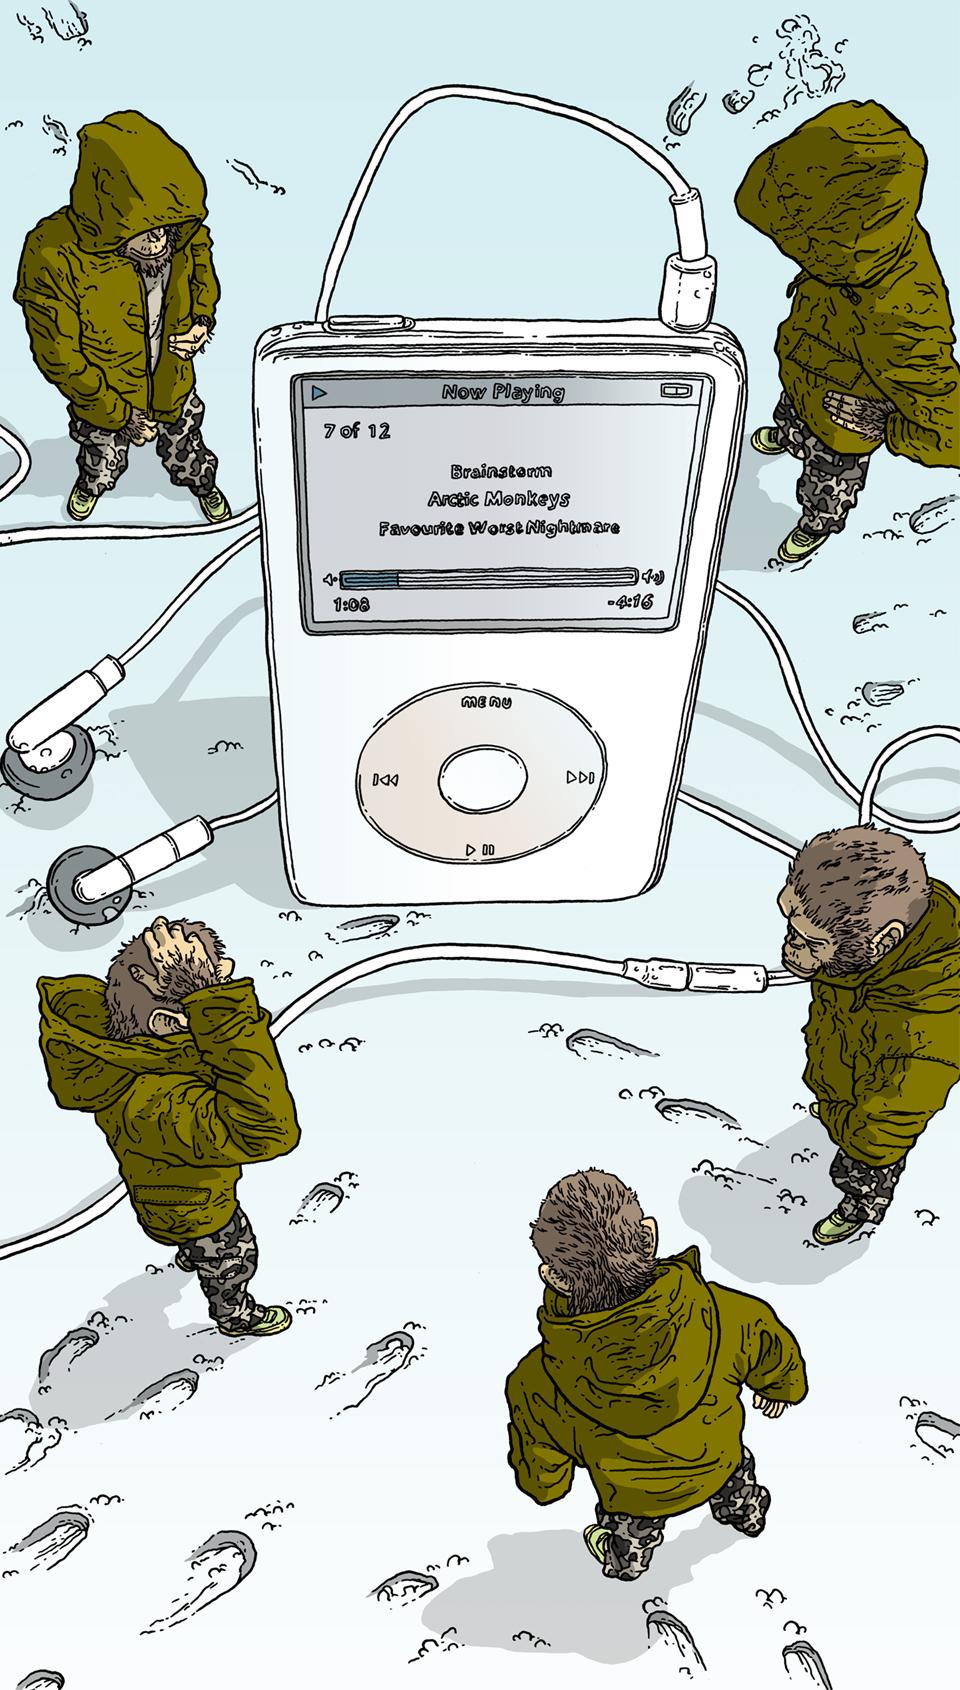 Conceptual illustration of arctic monkeys around an Ipod.